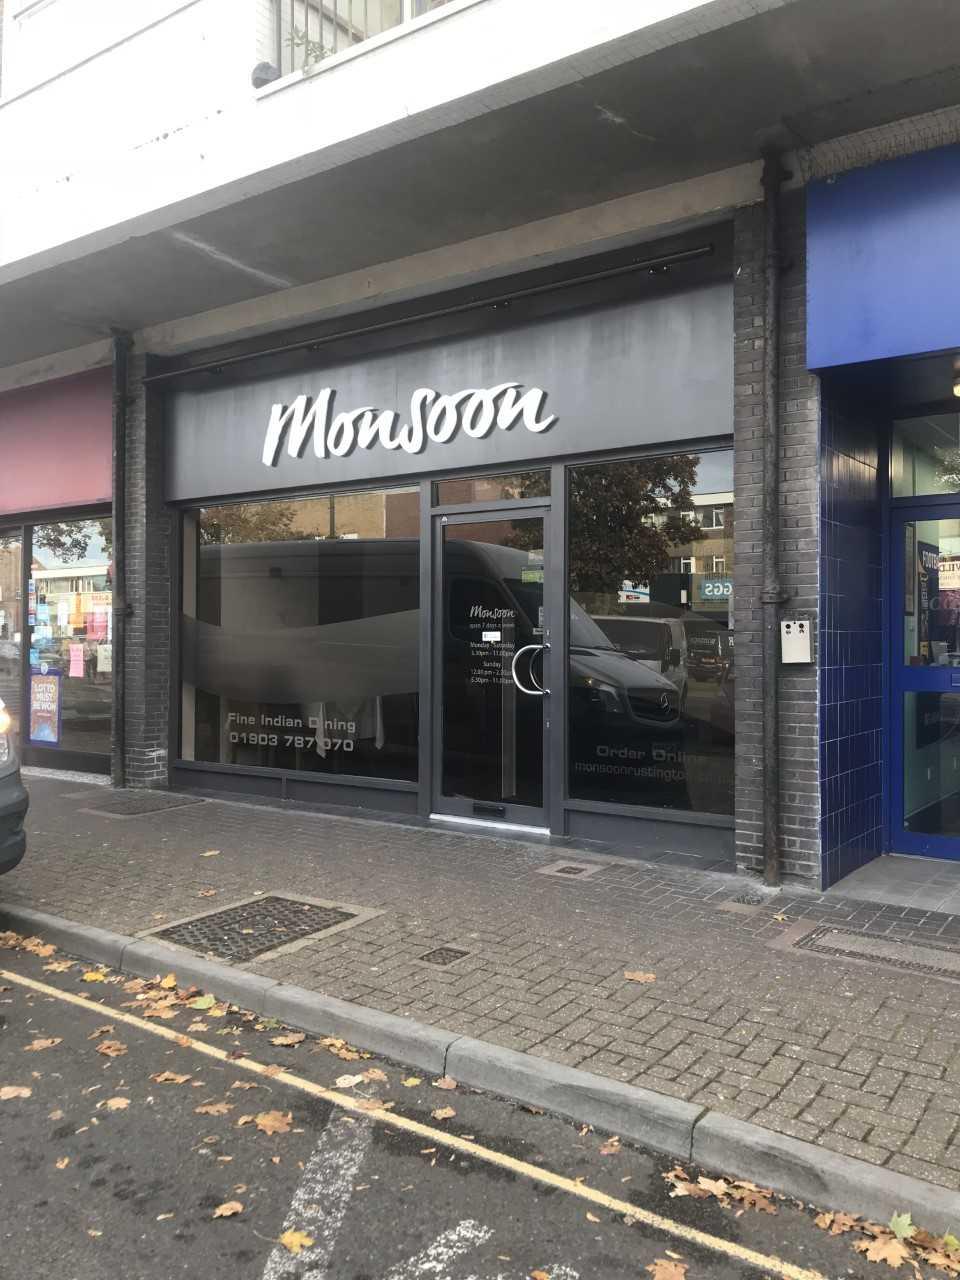 Monsoon Indian Restaurant in Rustington (1)